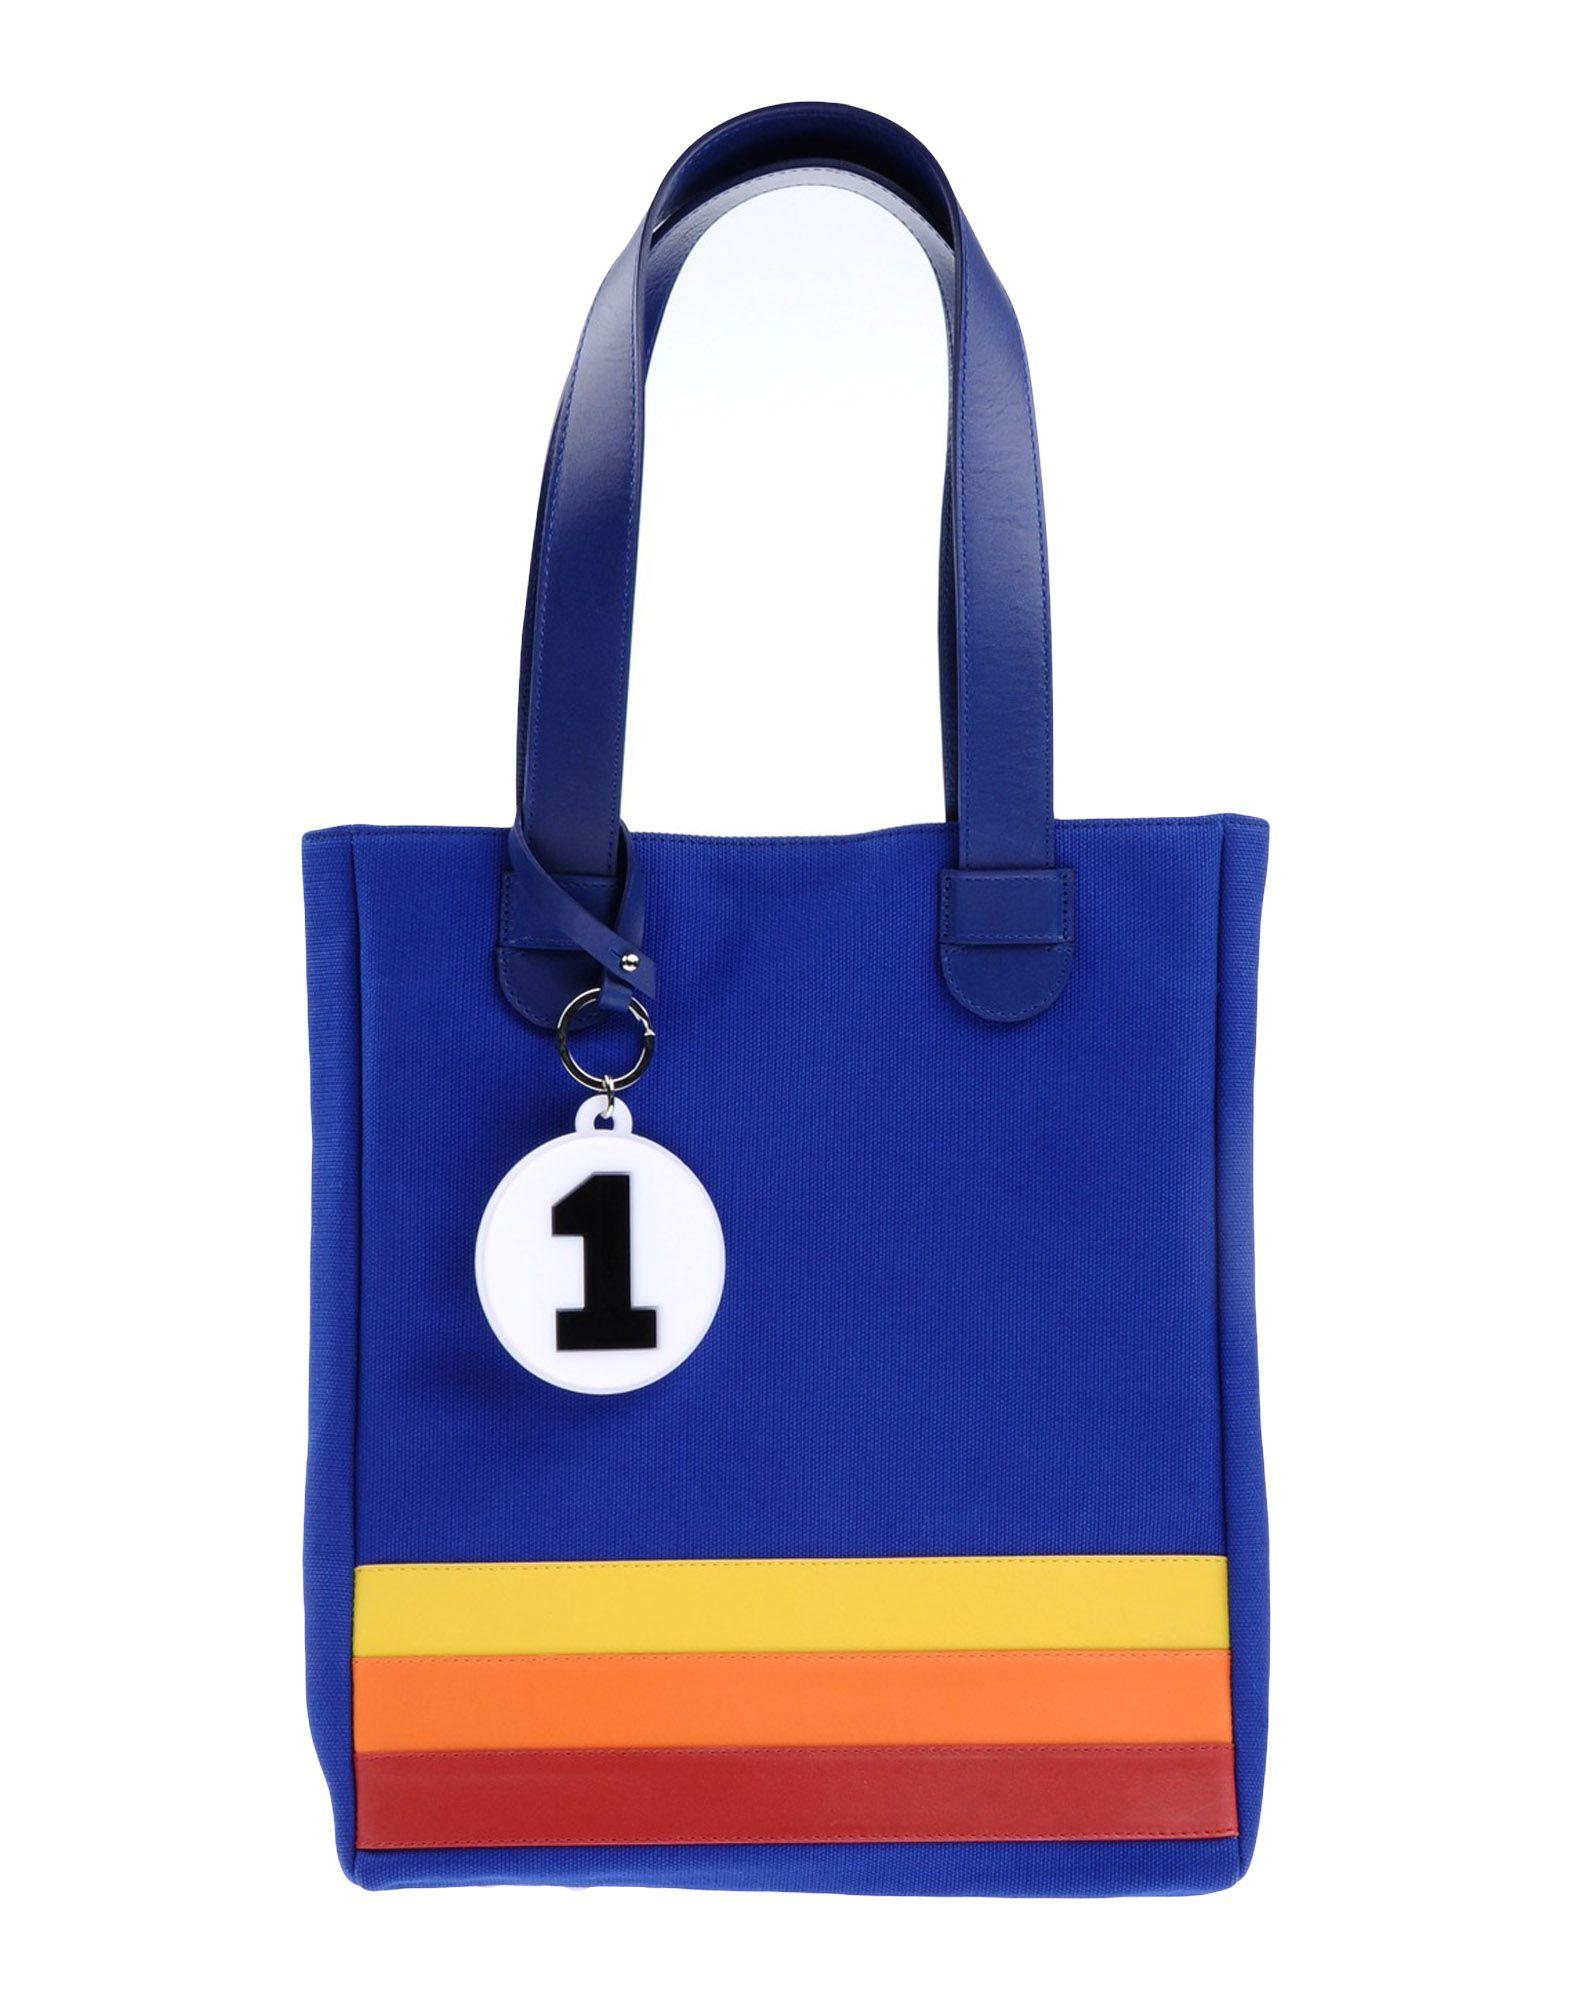 YAZBUKEY Handbag in Bright Blue